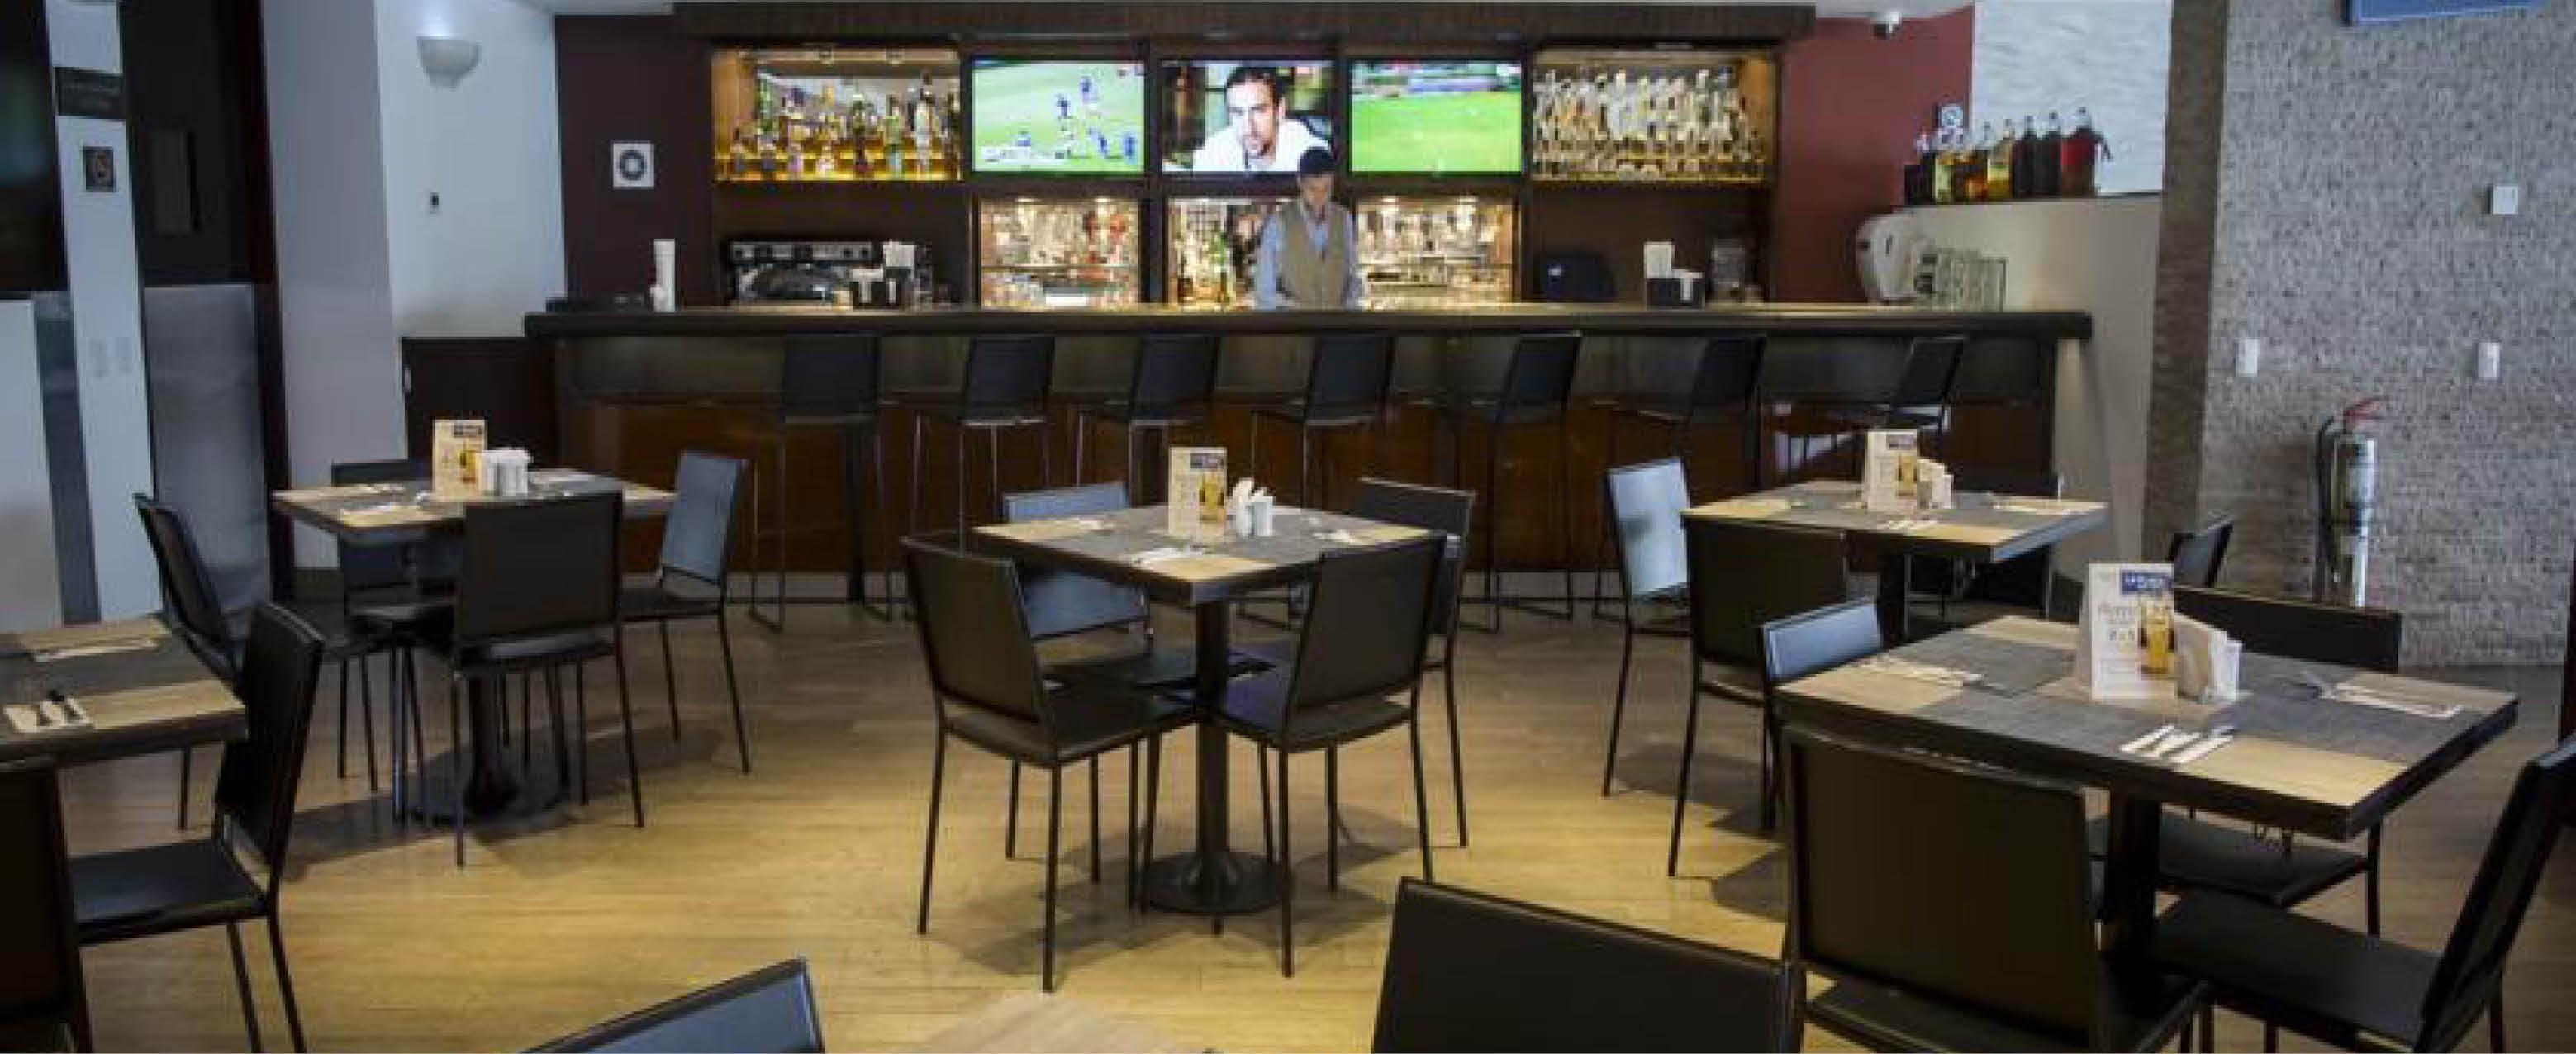 bar og restaurant på Hotel Casa Andina Select i lima